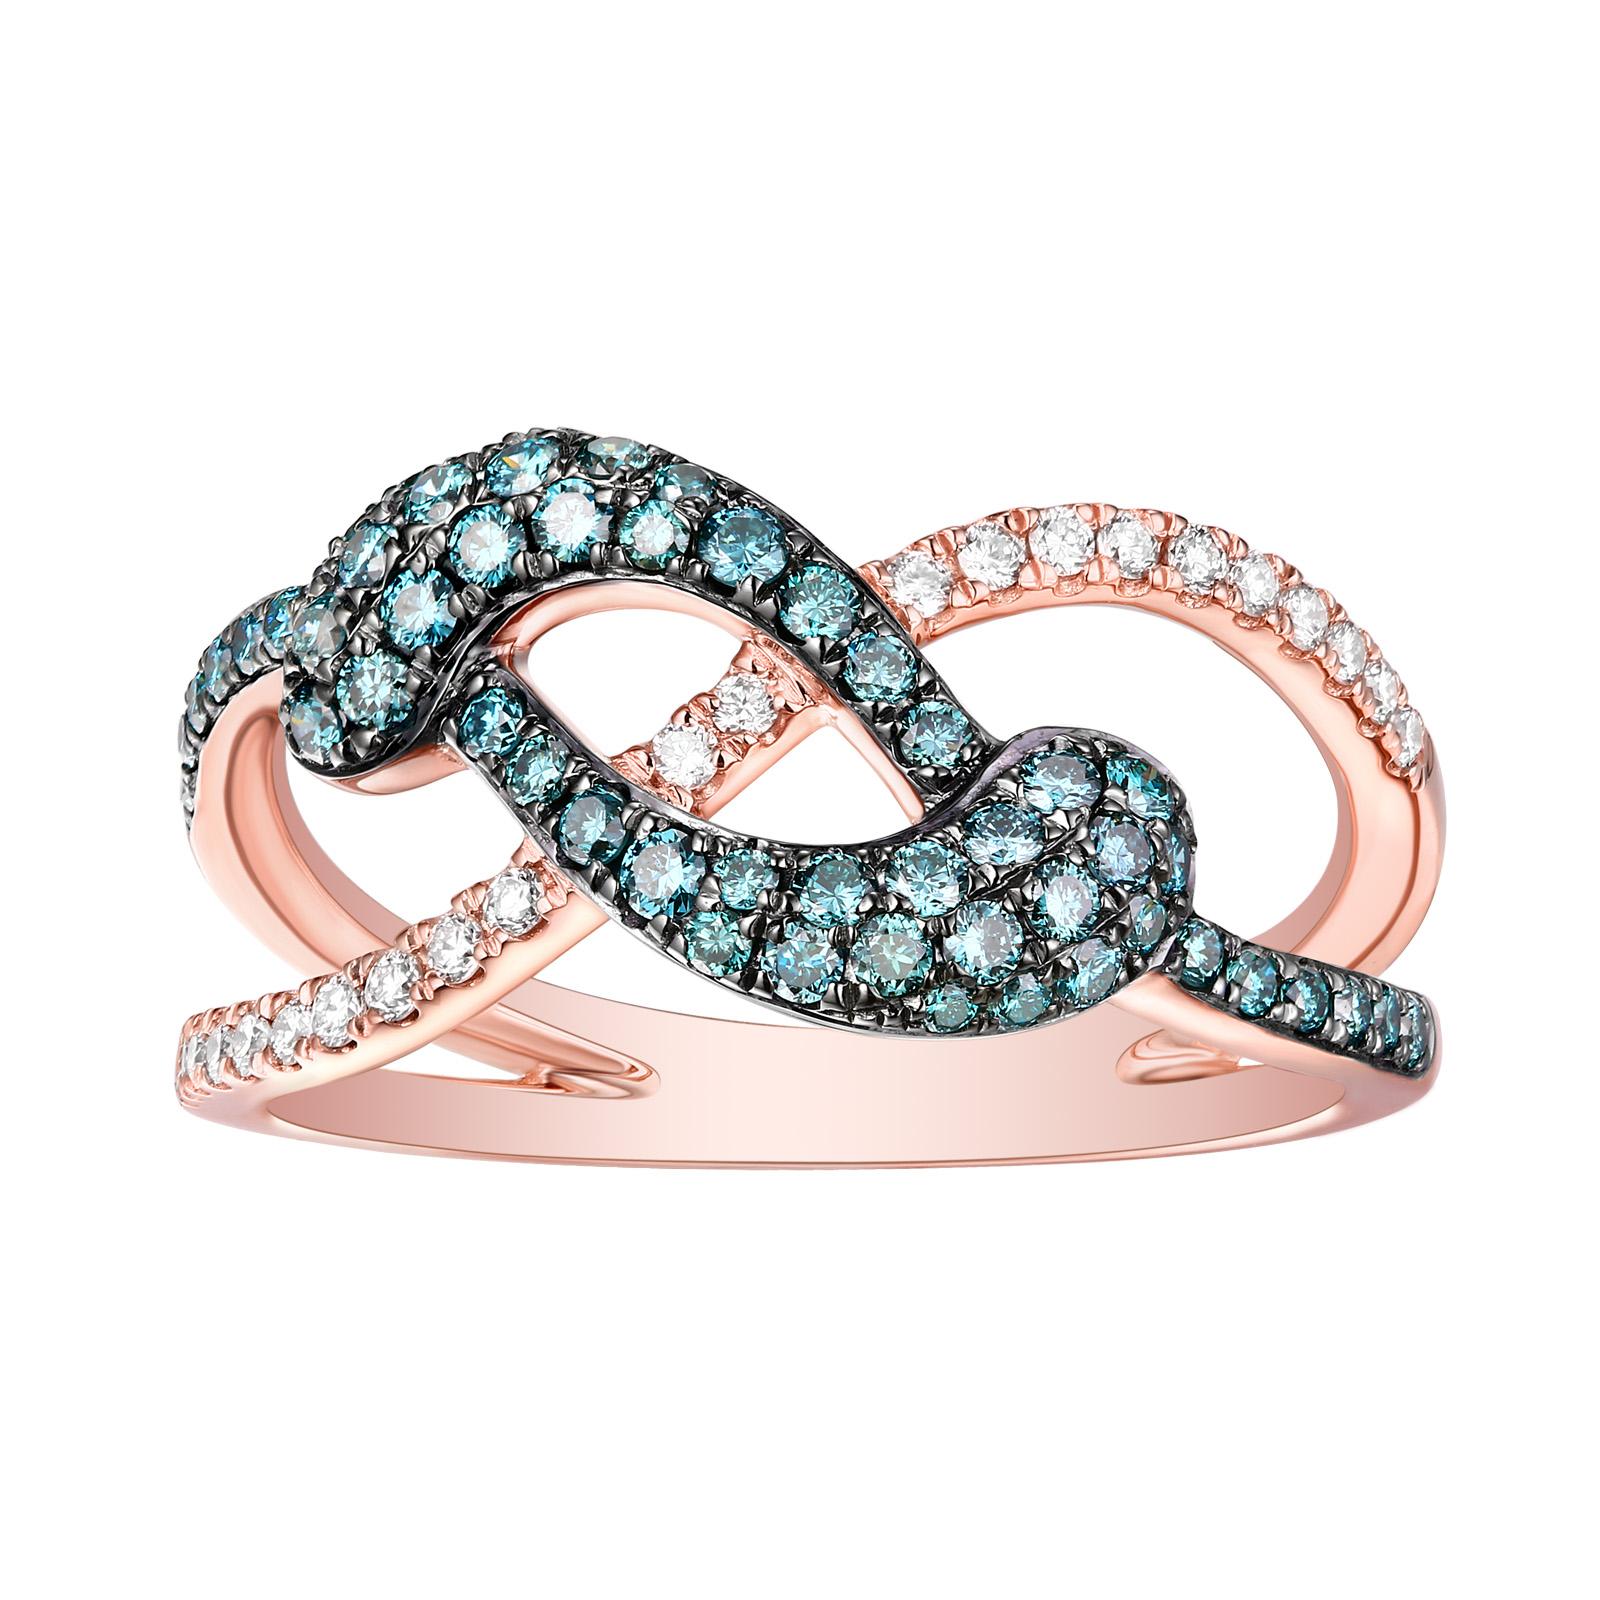 R26573ICE- 14K Rose Gold Diamond Ring , 0.60 TCW